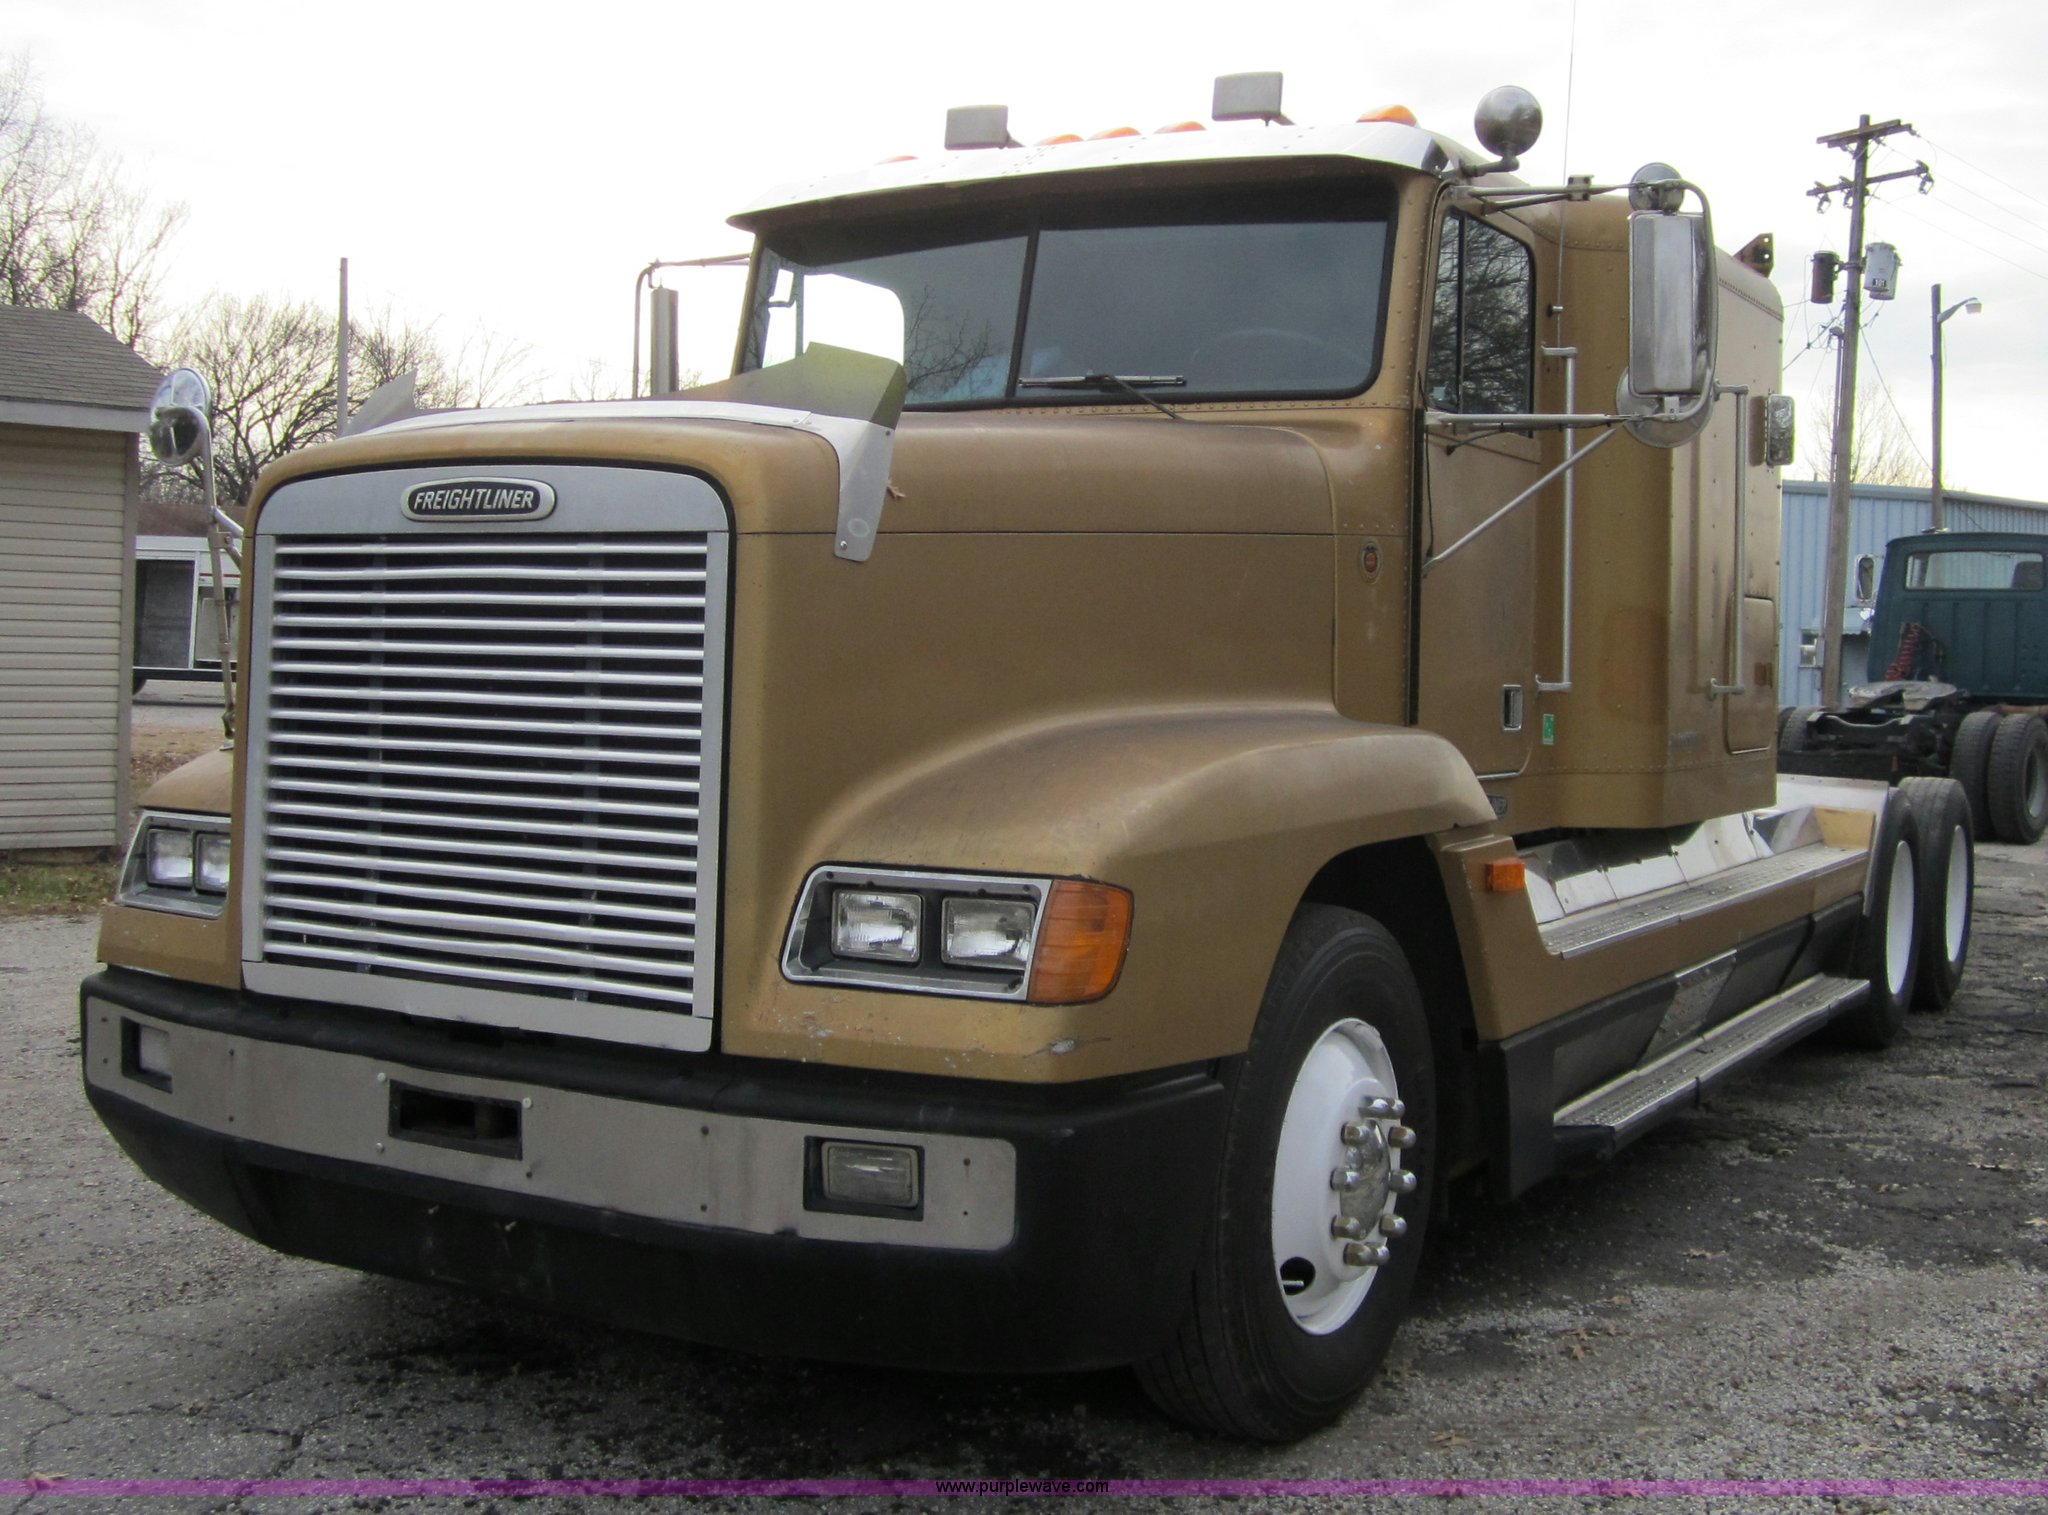 1993 Freightliner Fld120 Semi Truck Item 4344 Sold Apri Fuel Filter For 04 14 0l Frieghtliner Full Size In New Window